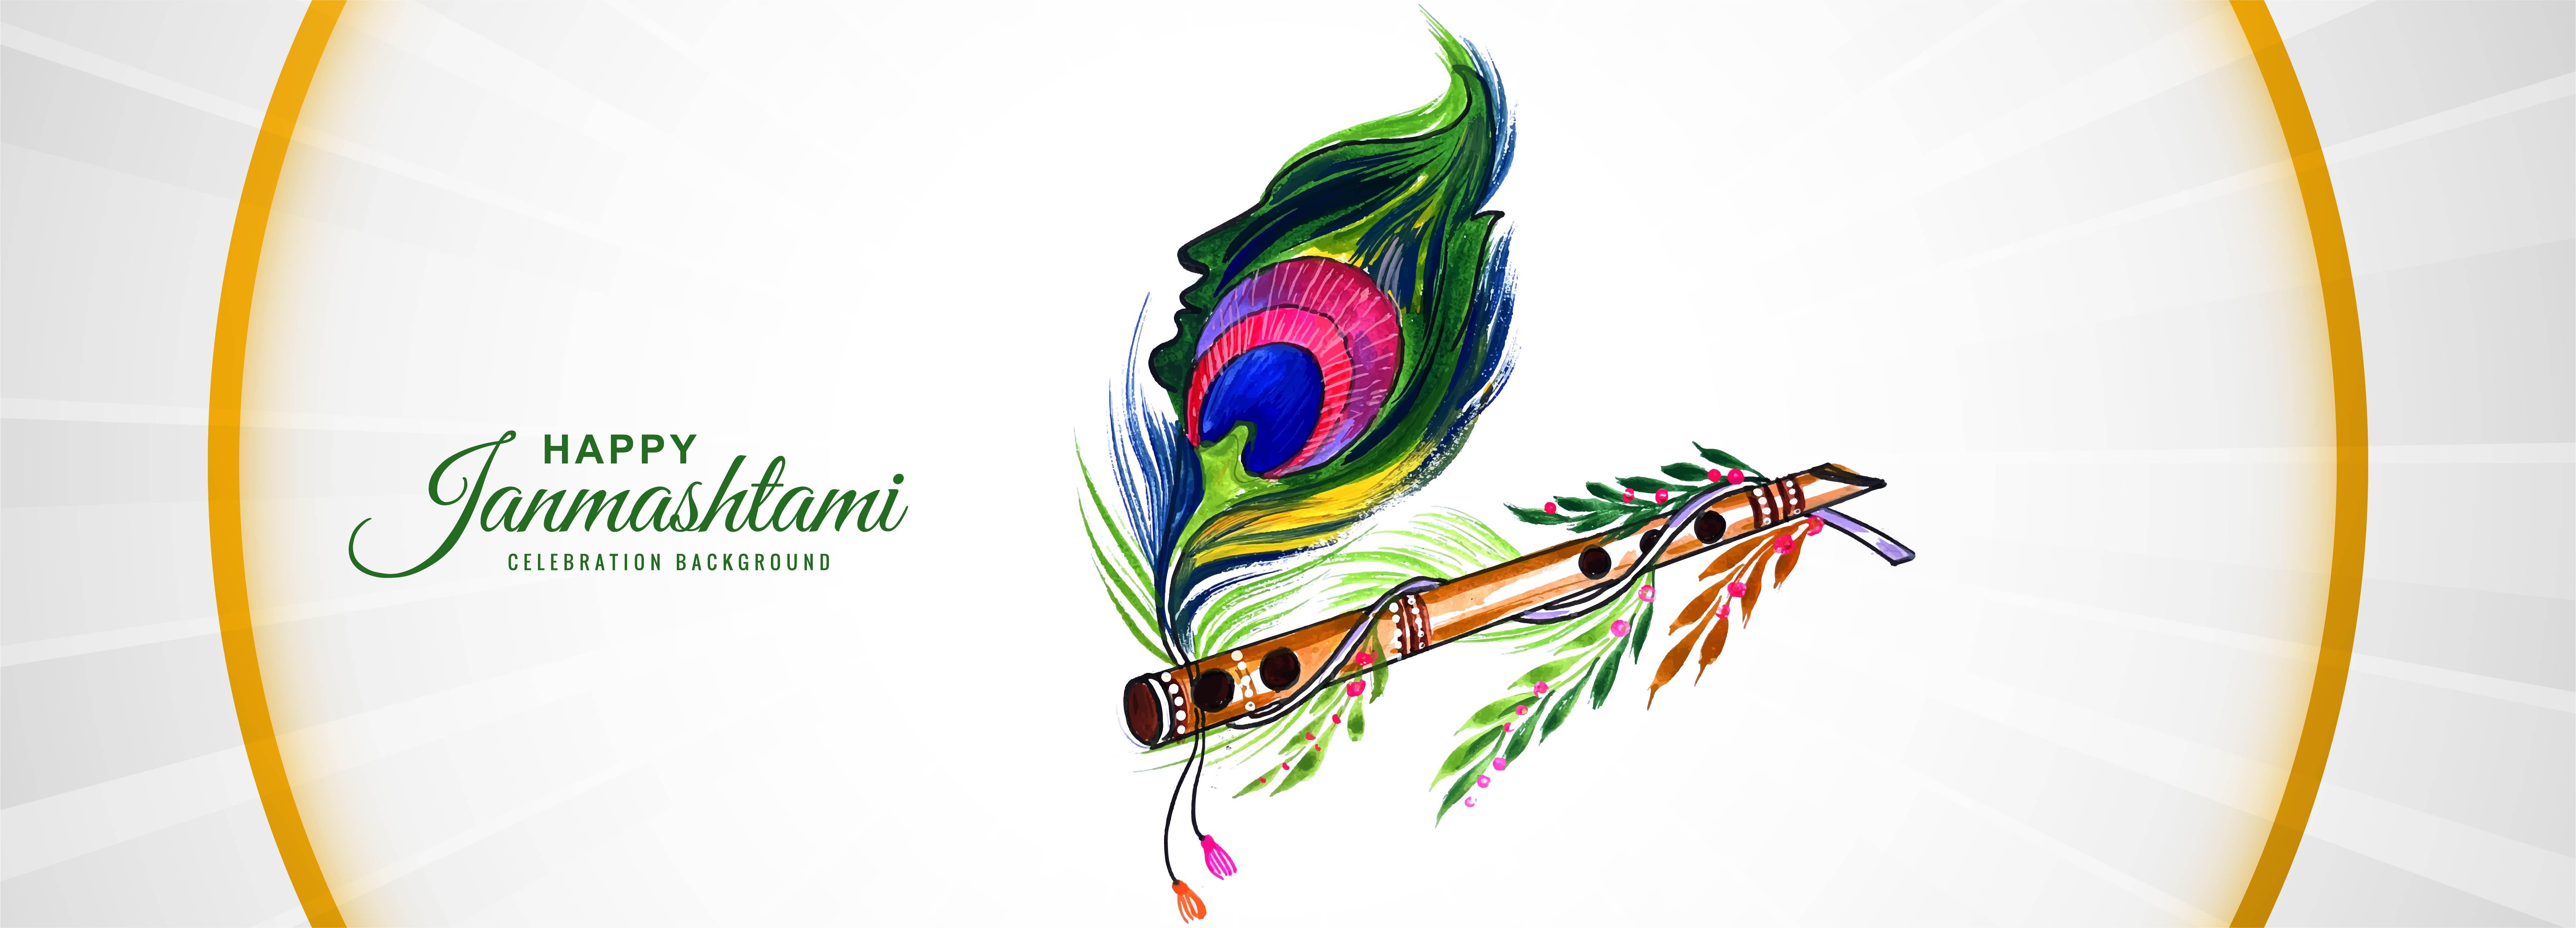 fondo de la bandera del festival shree krishna janmashtami